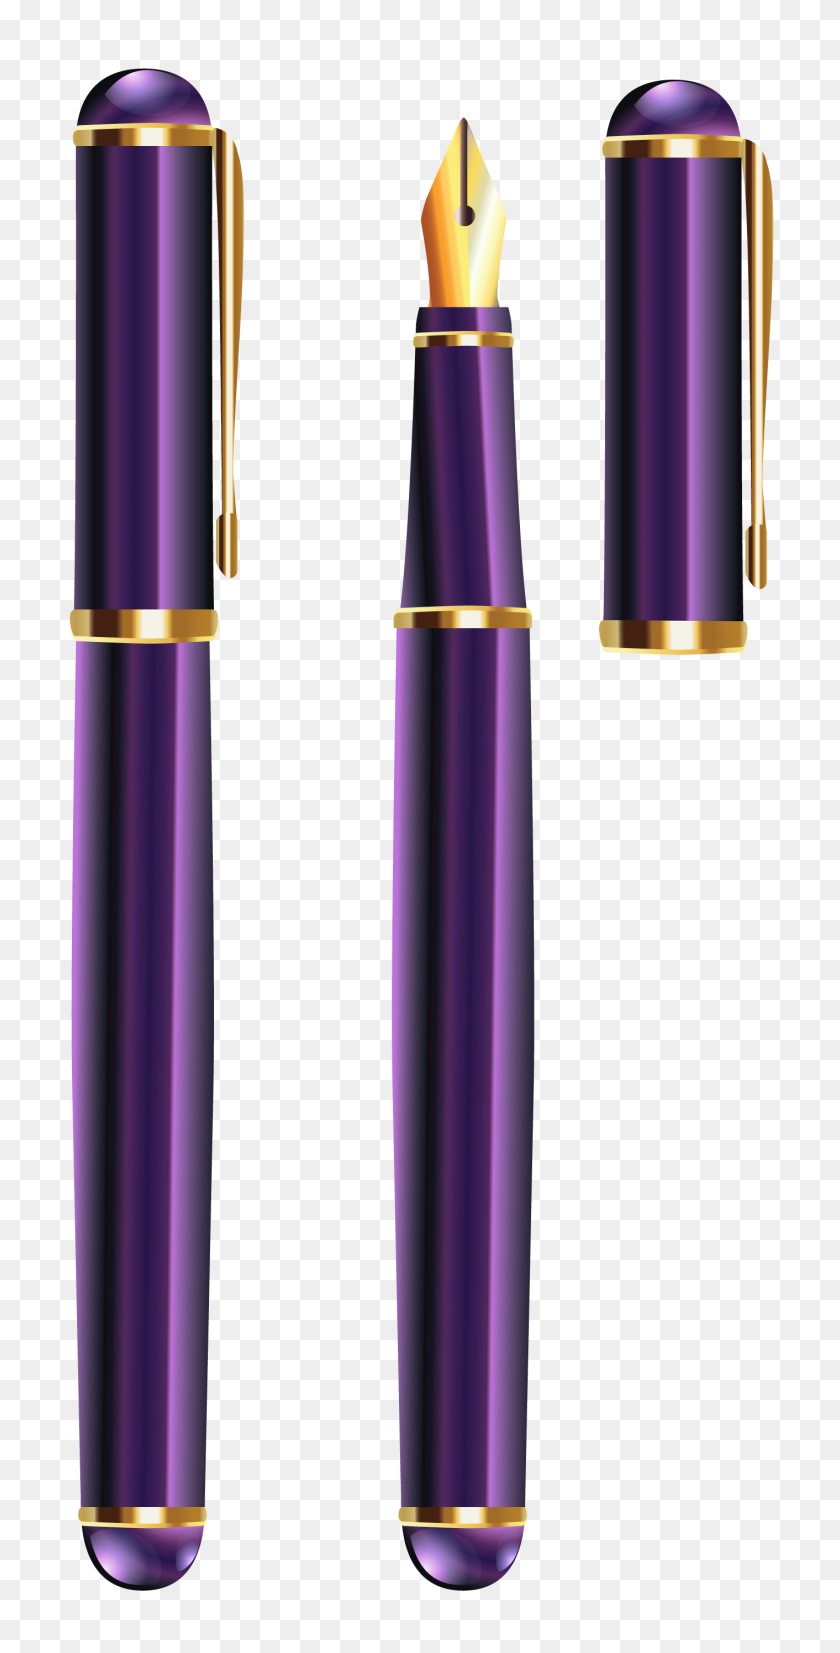 Ballpoint Pen Png Clipart - Pen PNG